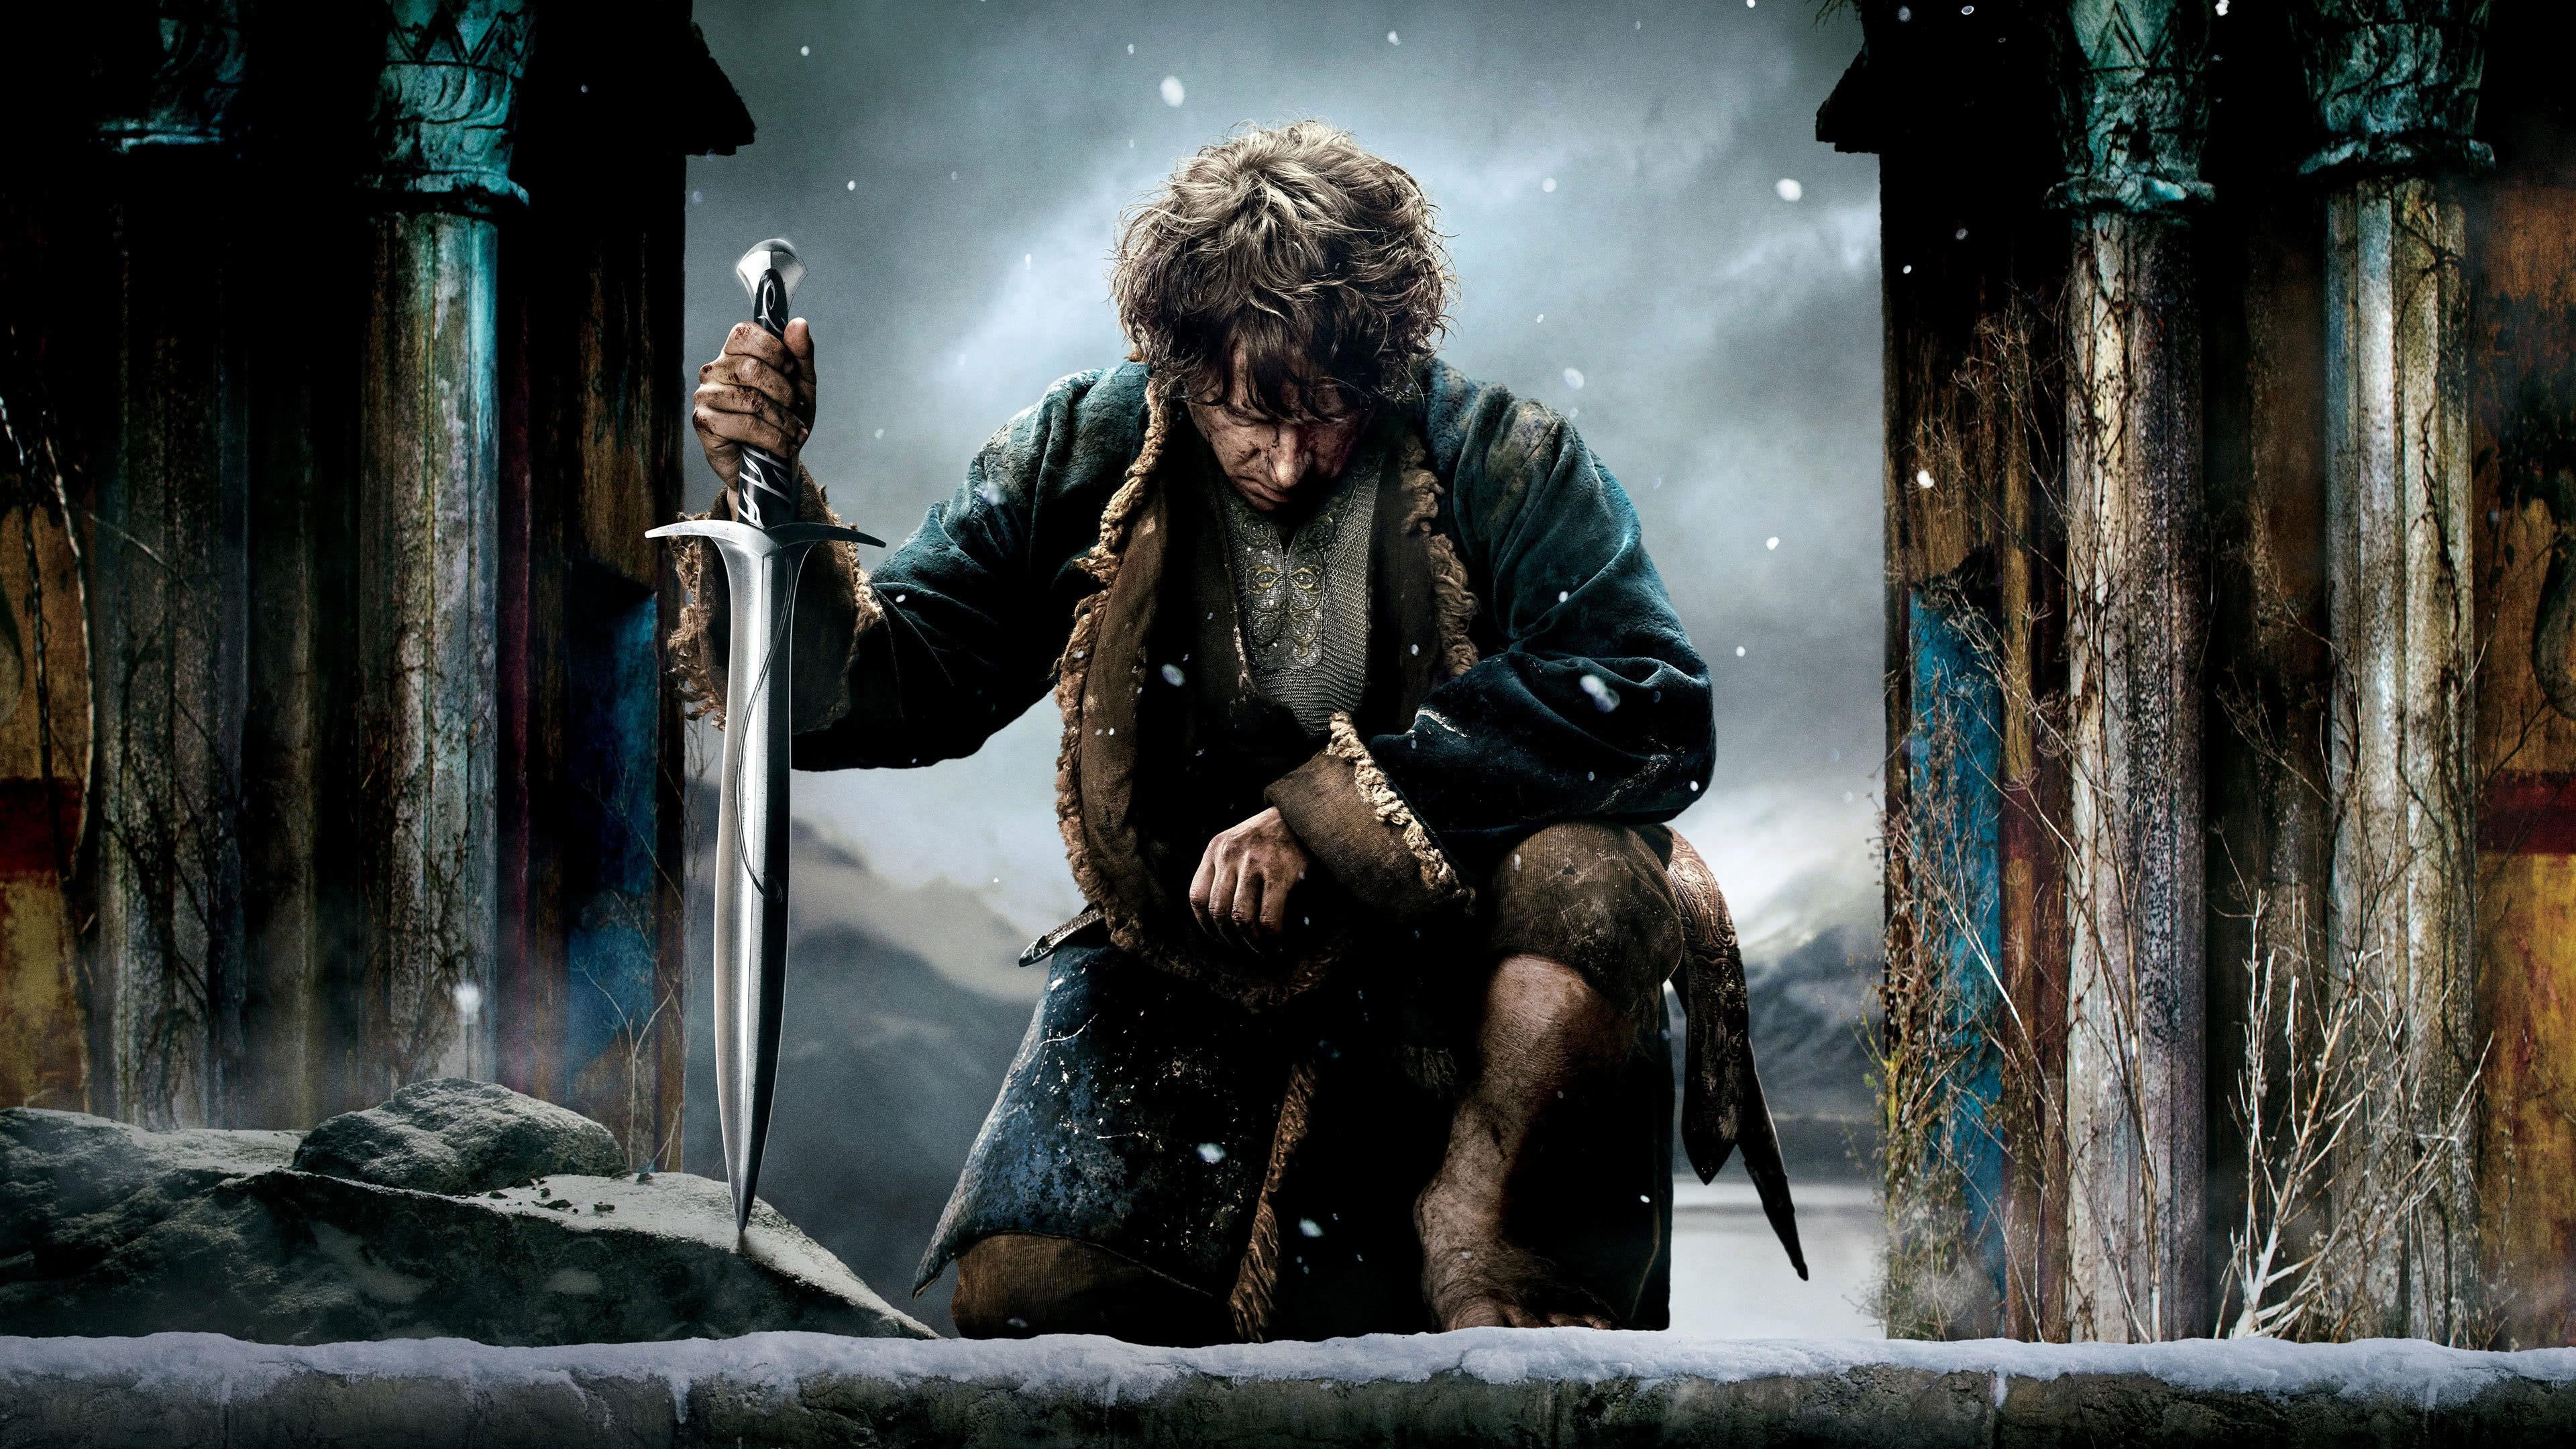 The Hobbit Bilbo Baggins Uhd 4k Wallpaper Pixelz